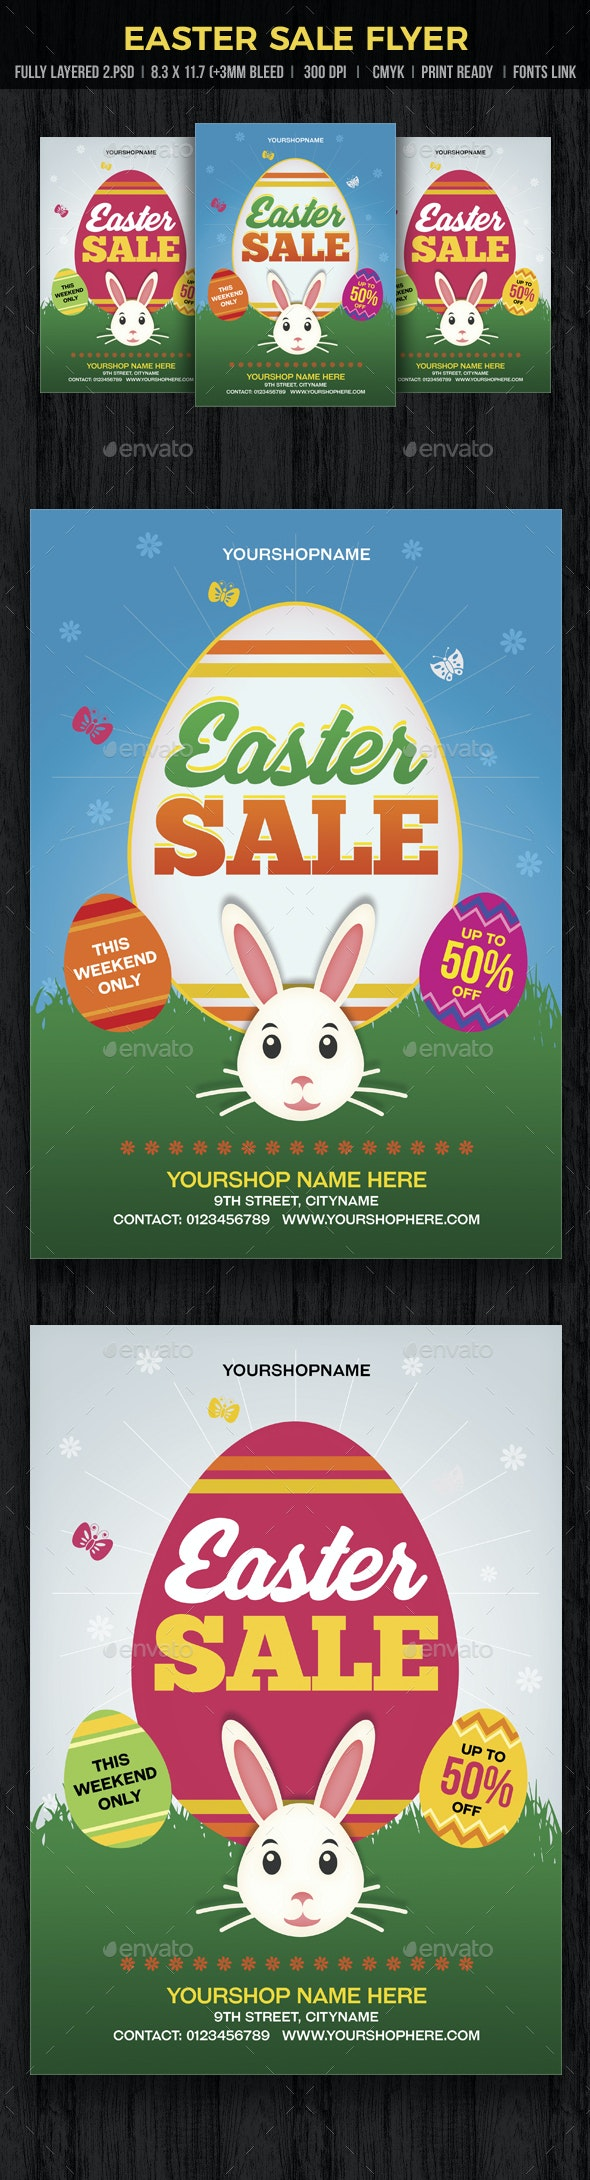 Easter Sale Flyer - Flyers Print Templates